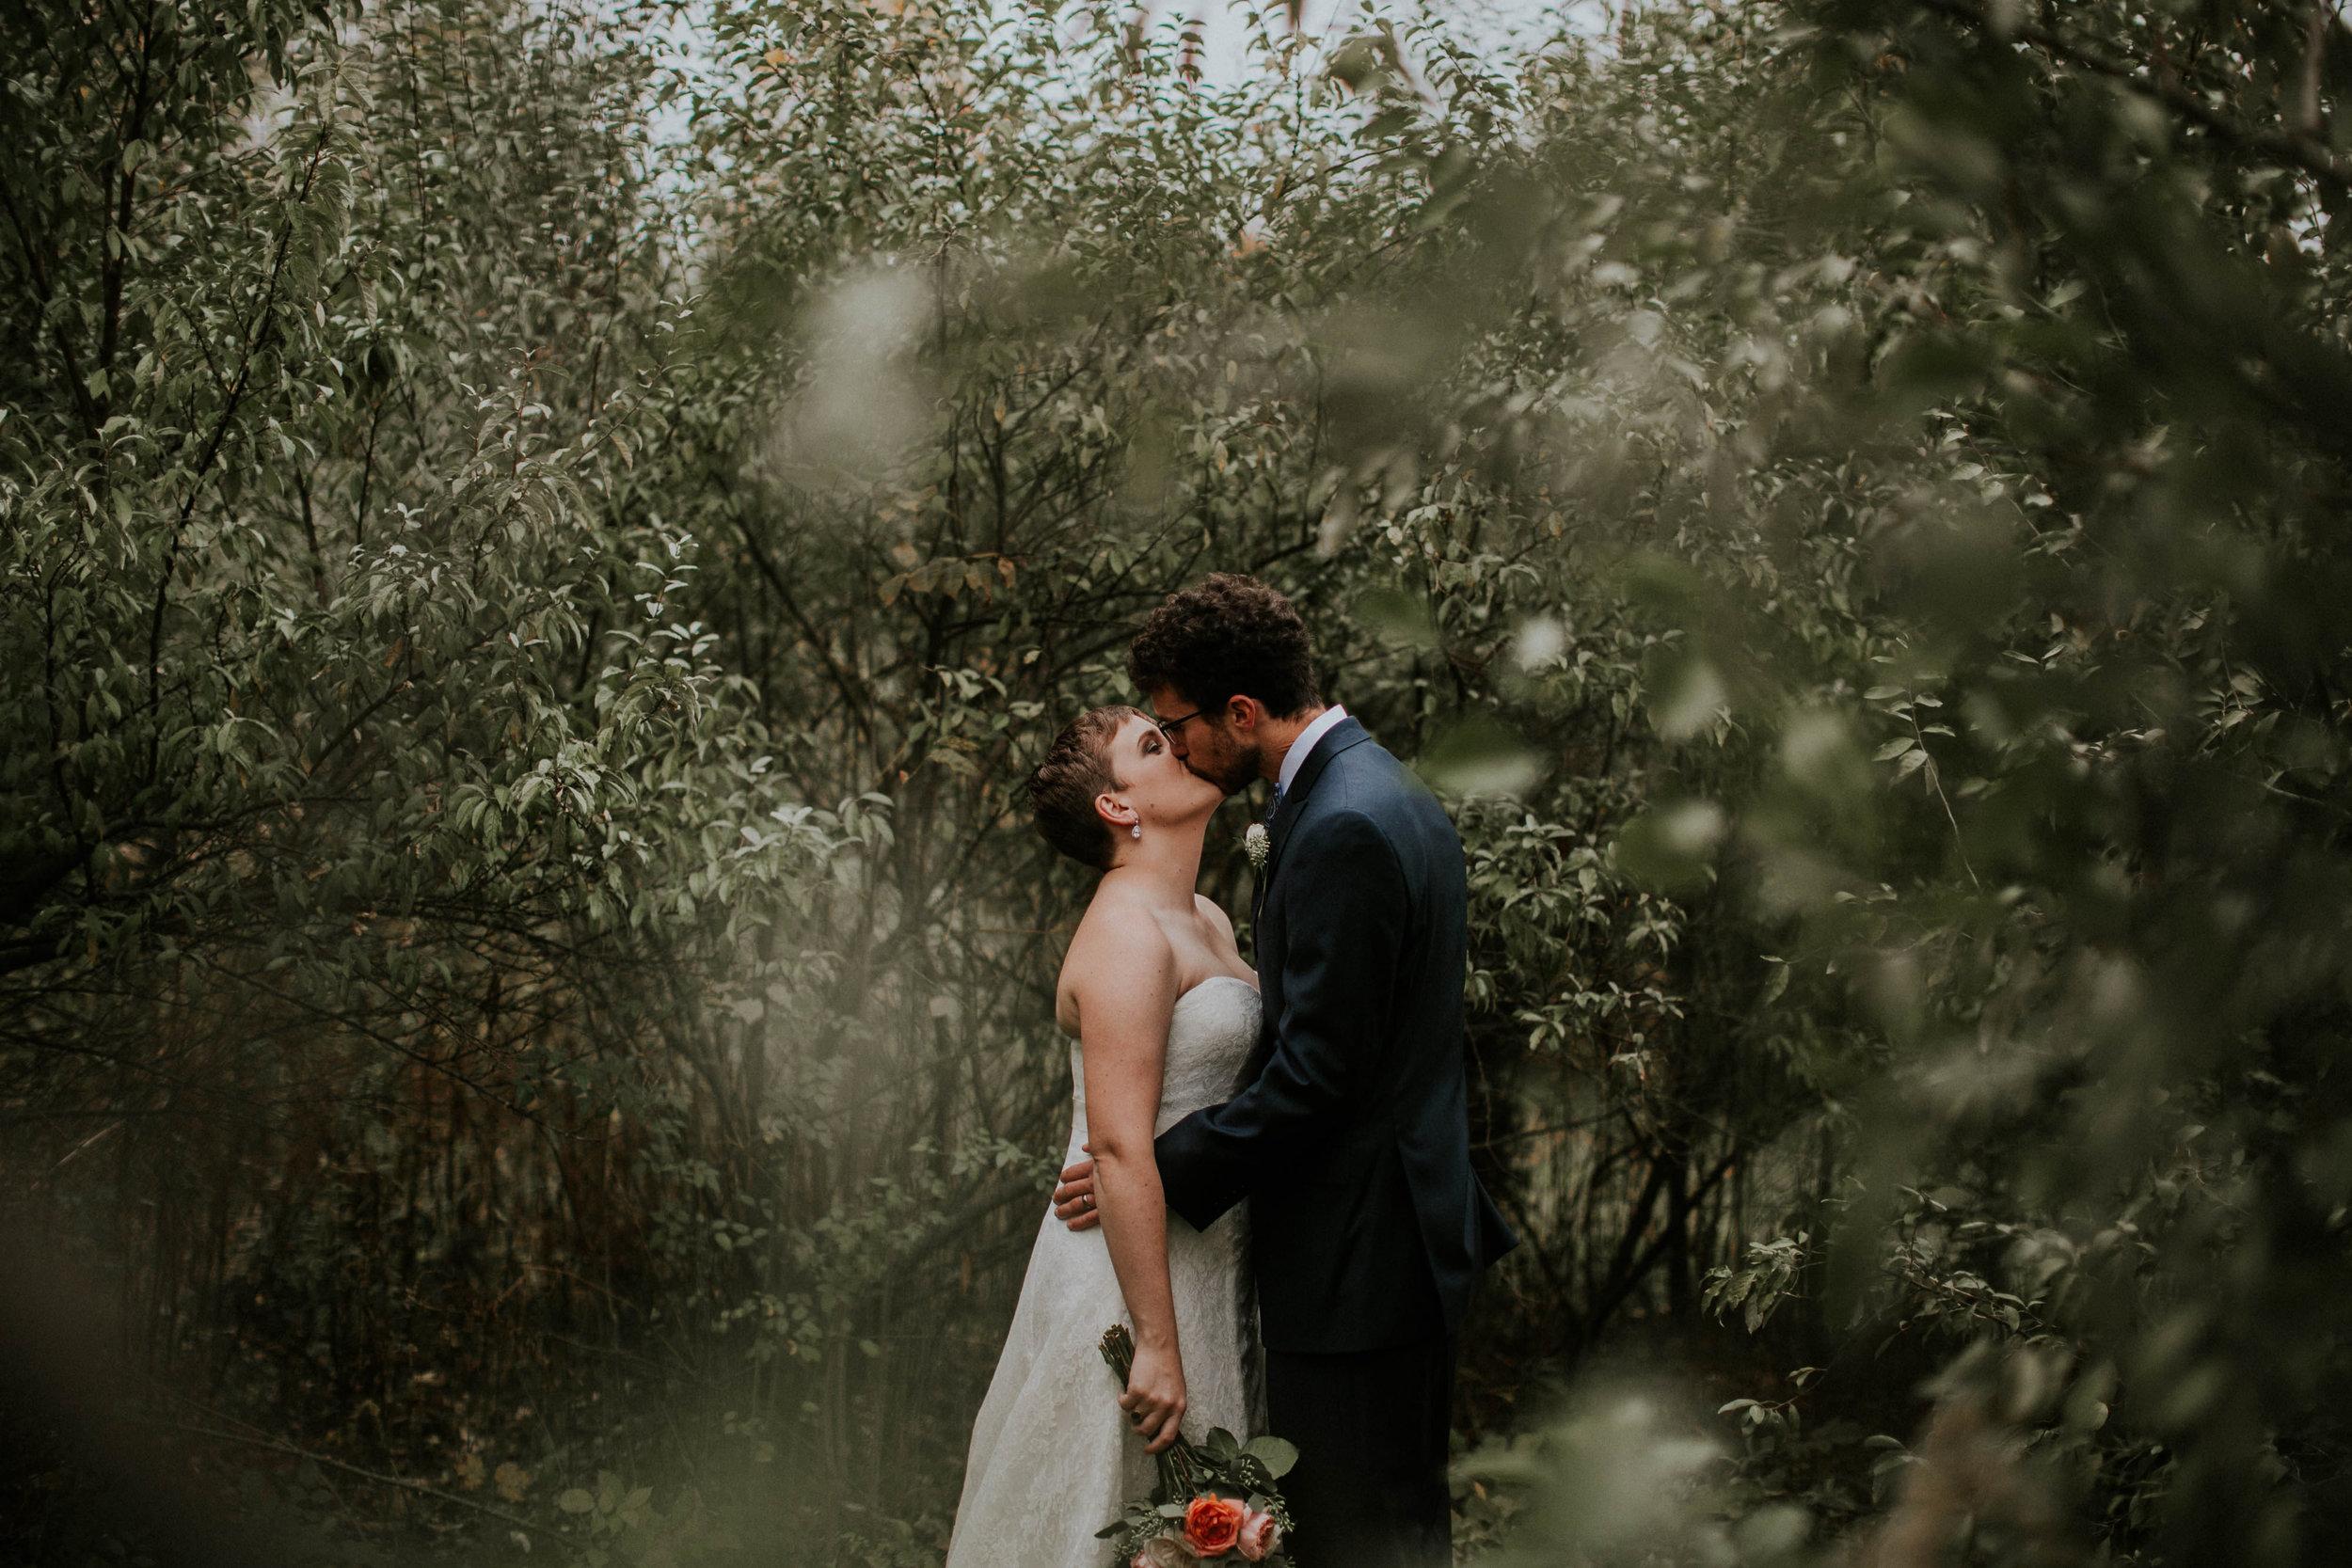 Columbus ohio wedding photographer grace e jones photography real fun joyful wedding21.jpg